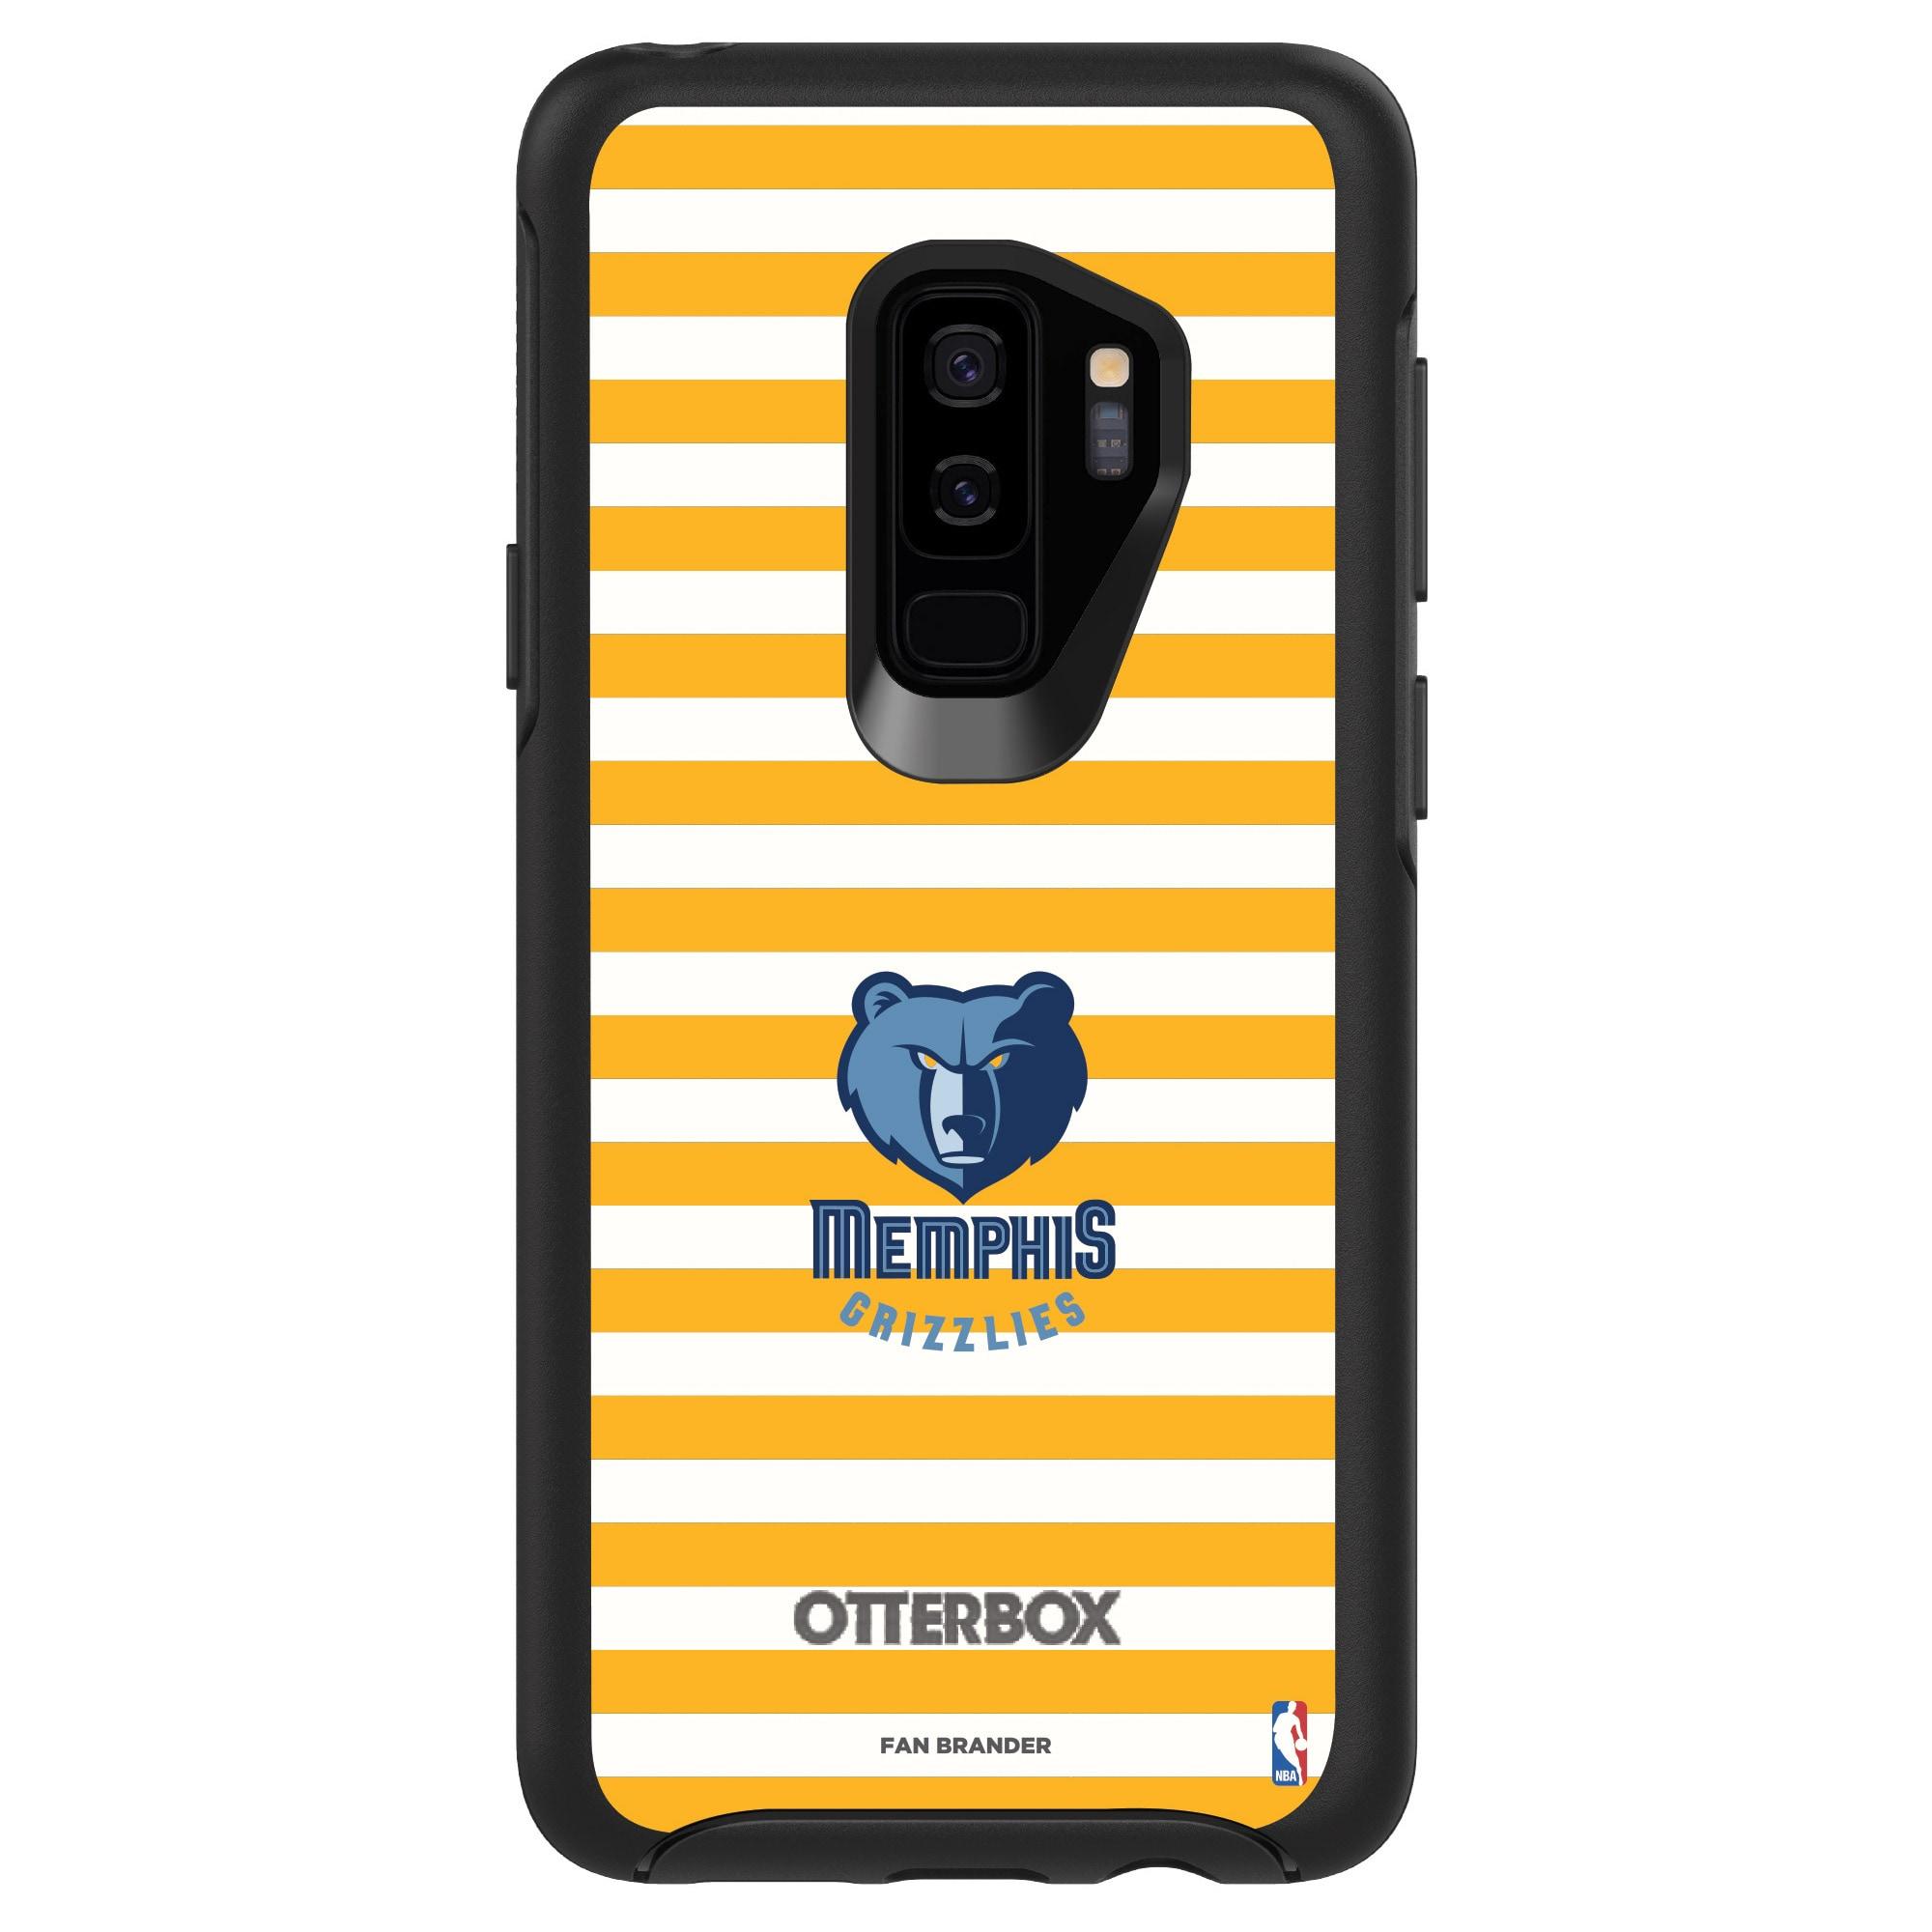 Memphis Grizzlies OtterBox Galaxy Symmetry Striped Design Case